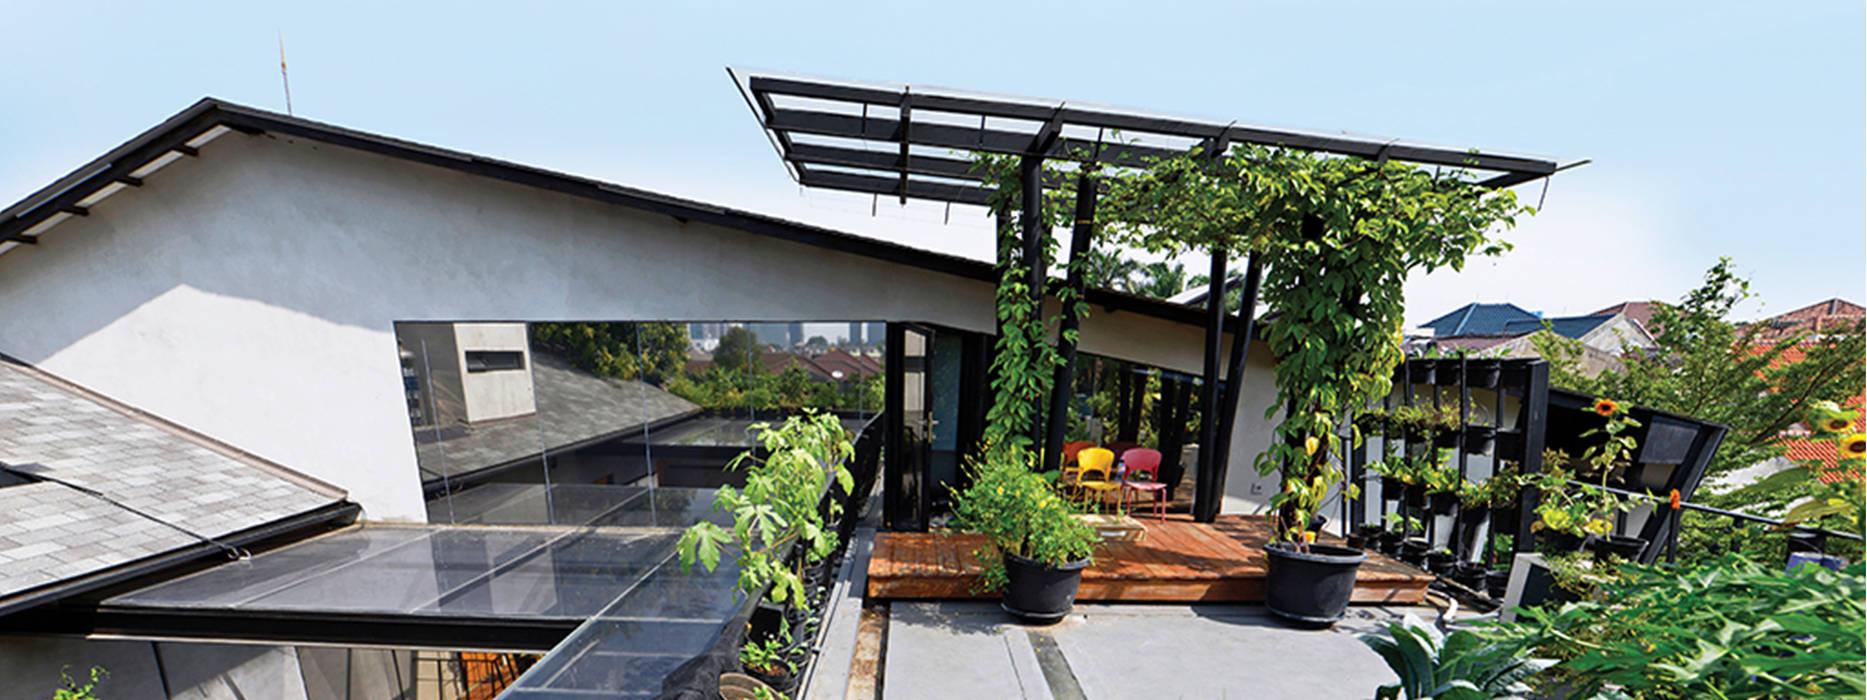 banner picture Oleh sigit.kusumawijaya | architect & urbandesigner Industrial Besi/Baja